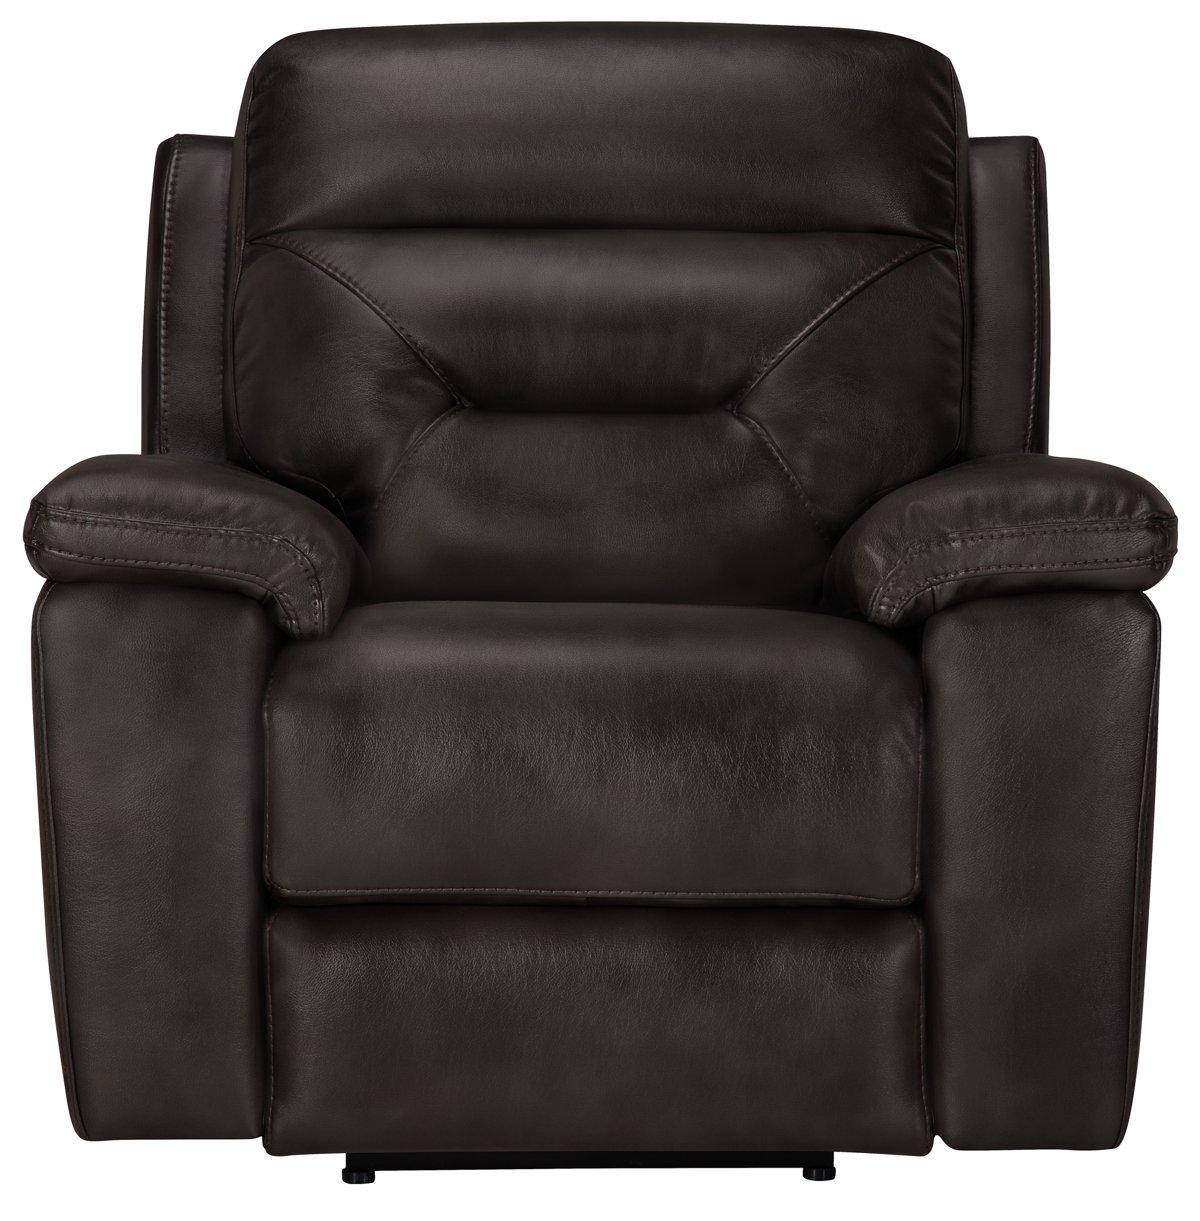 city furniture phoenix dk gray microfiber recliner